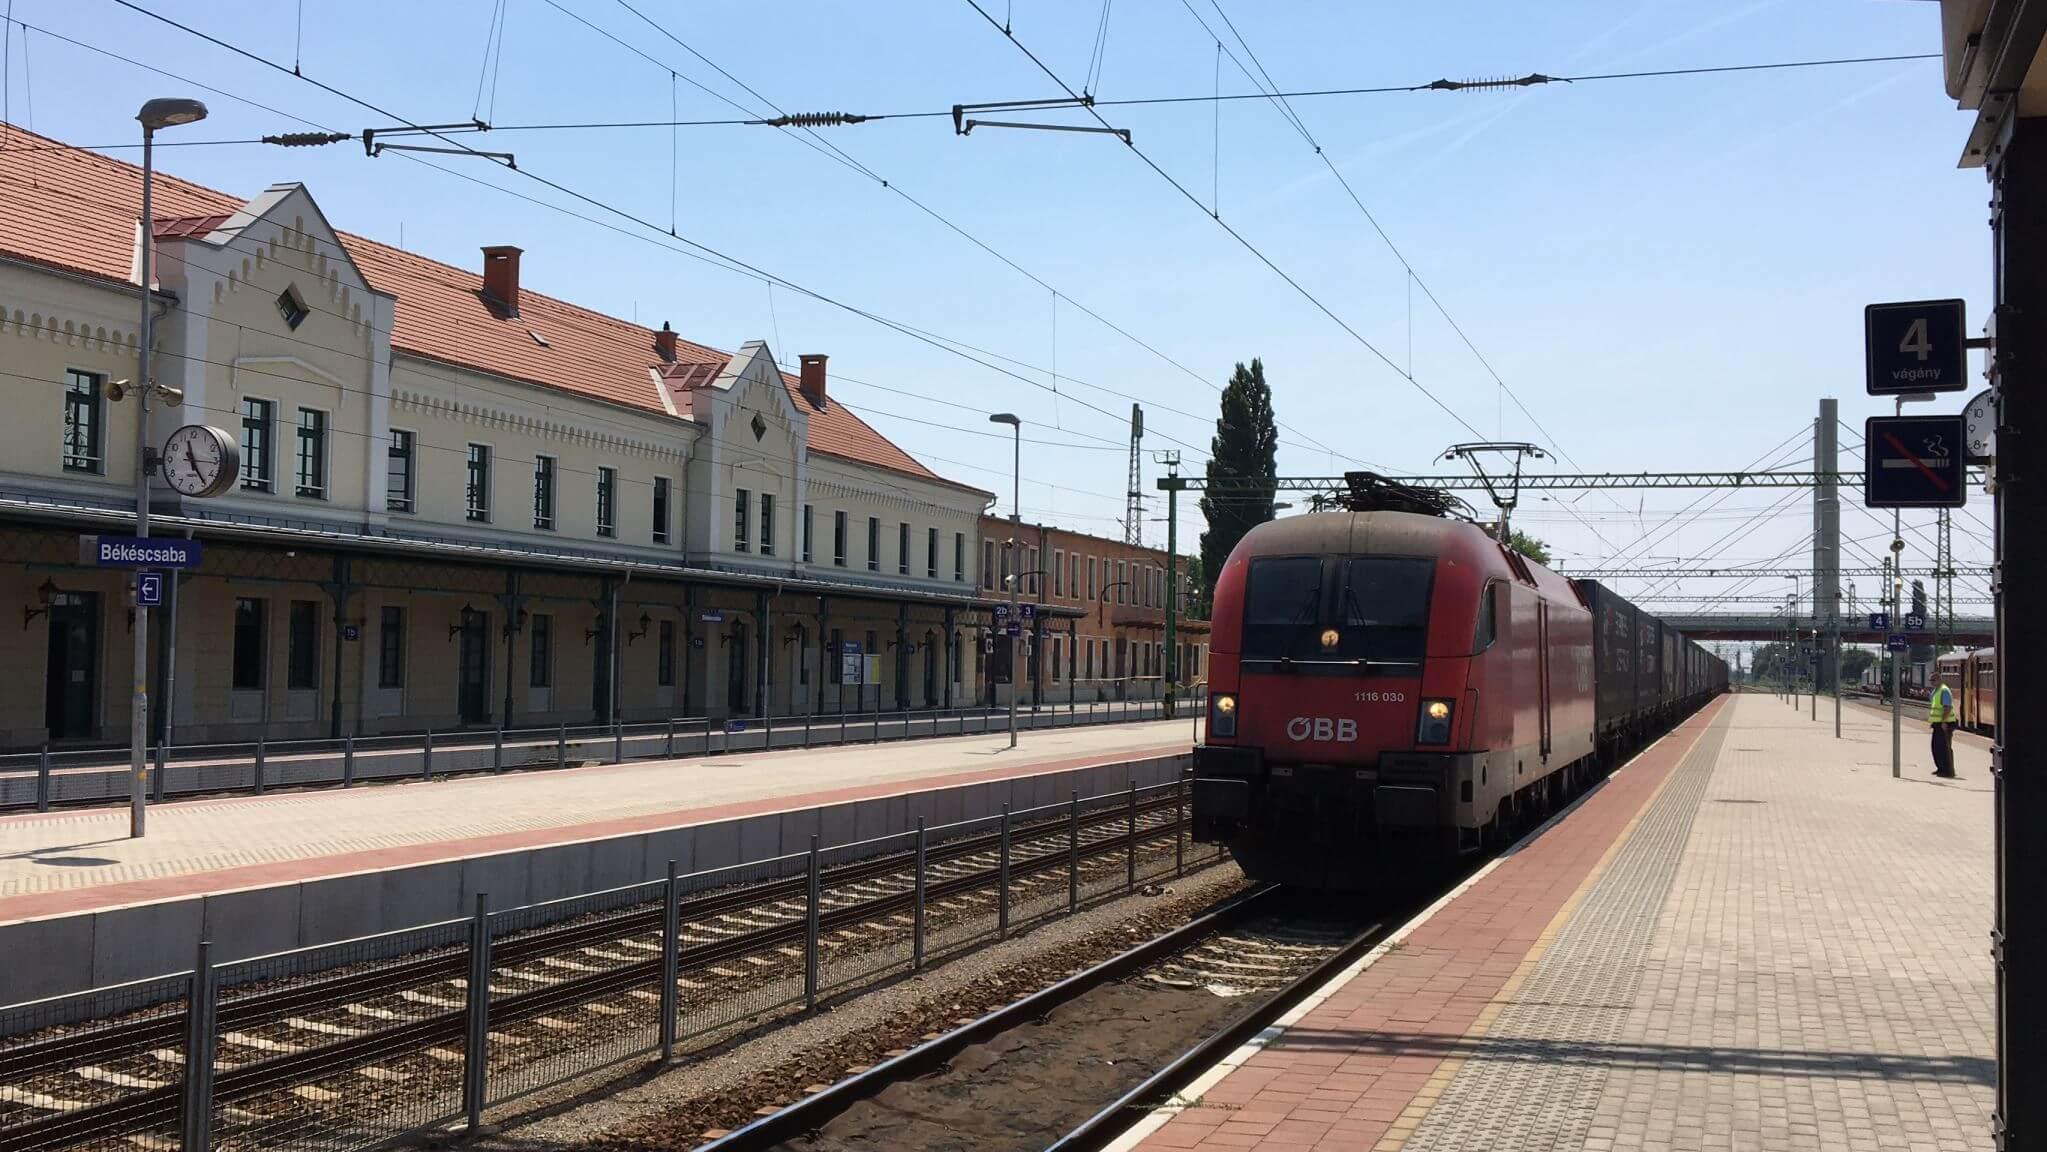 Freight Train in Bekescsaba, Hungary